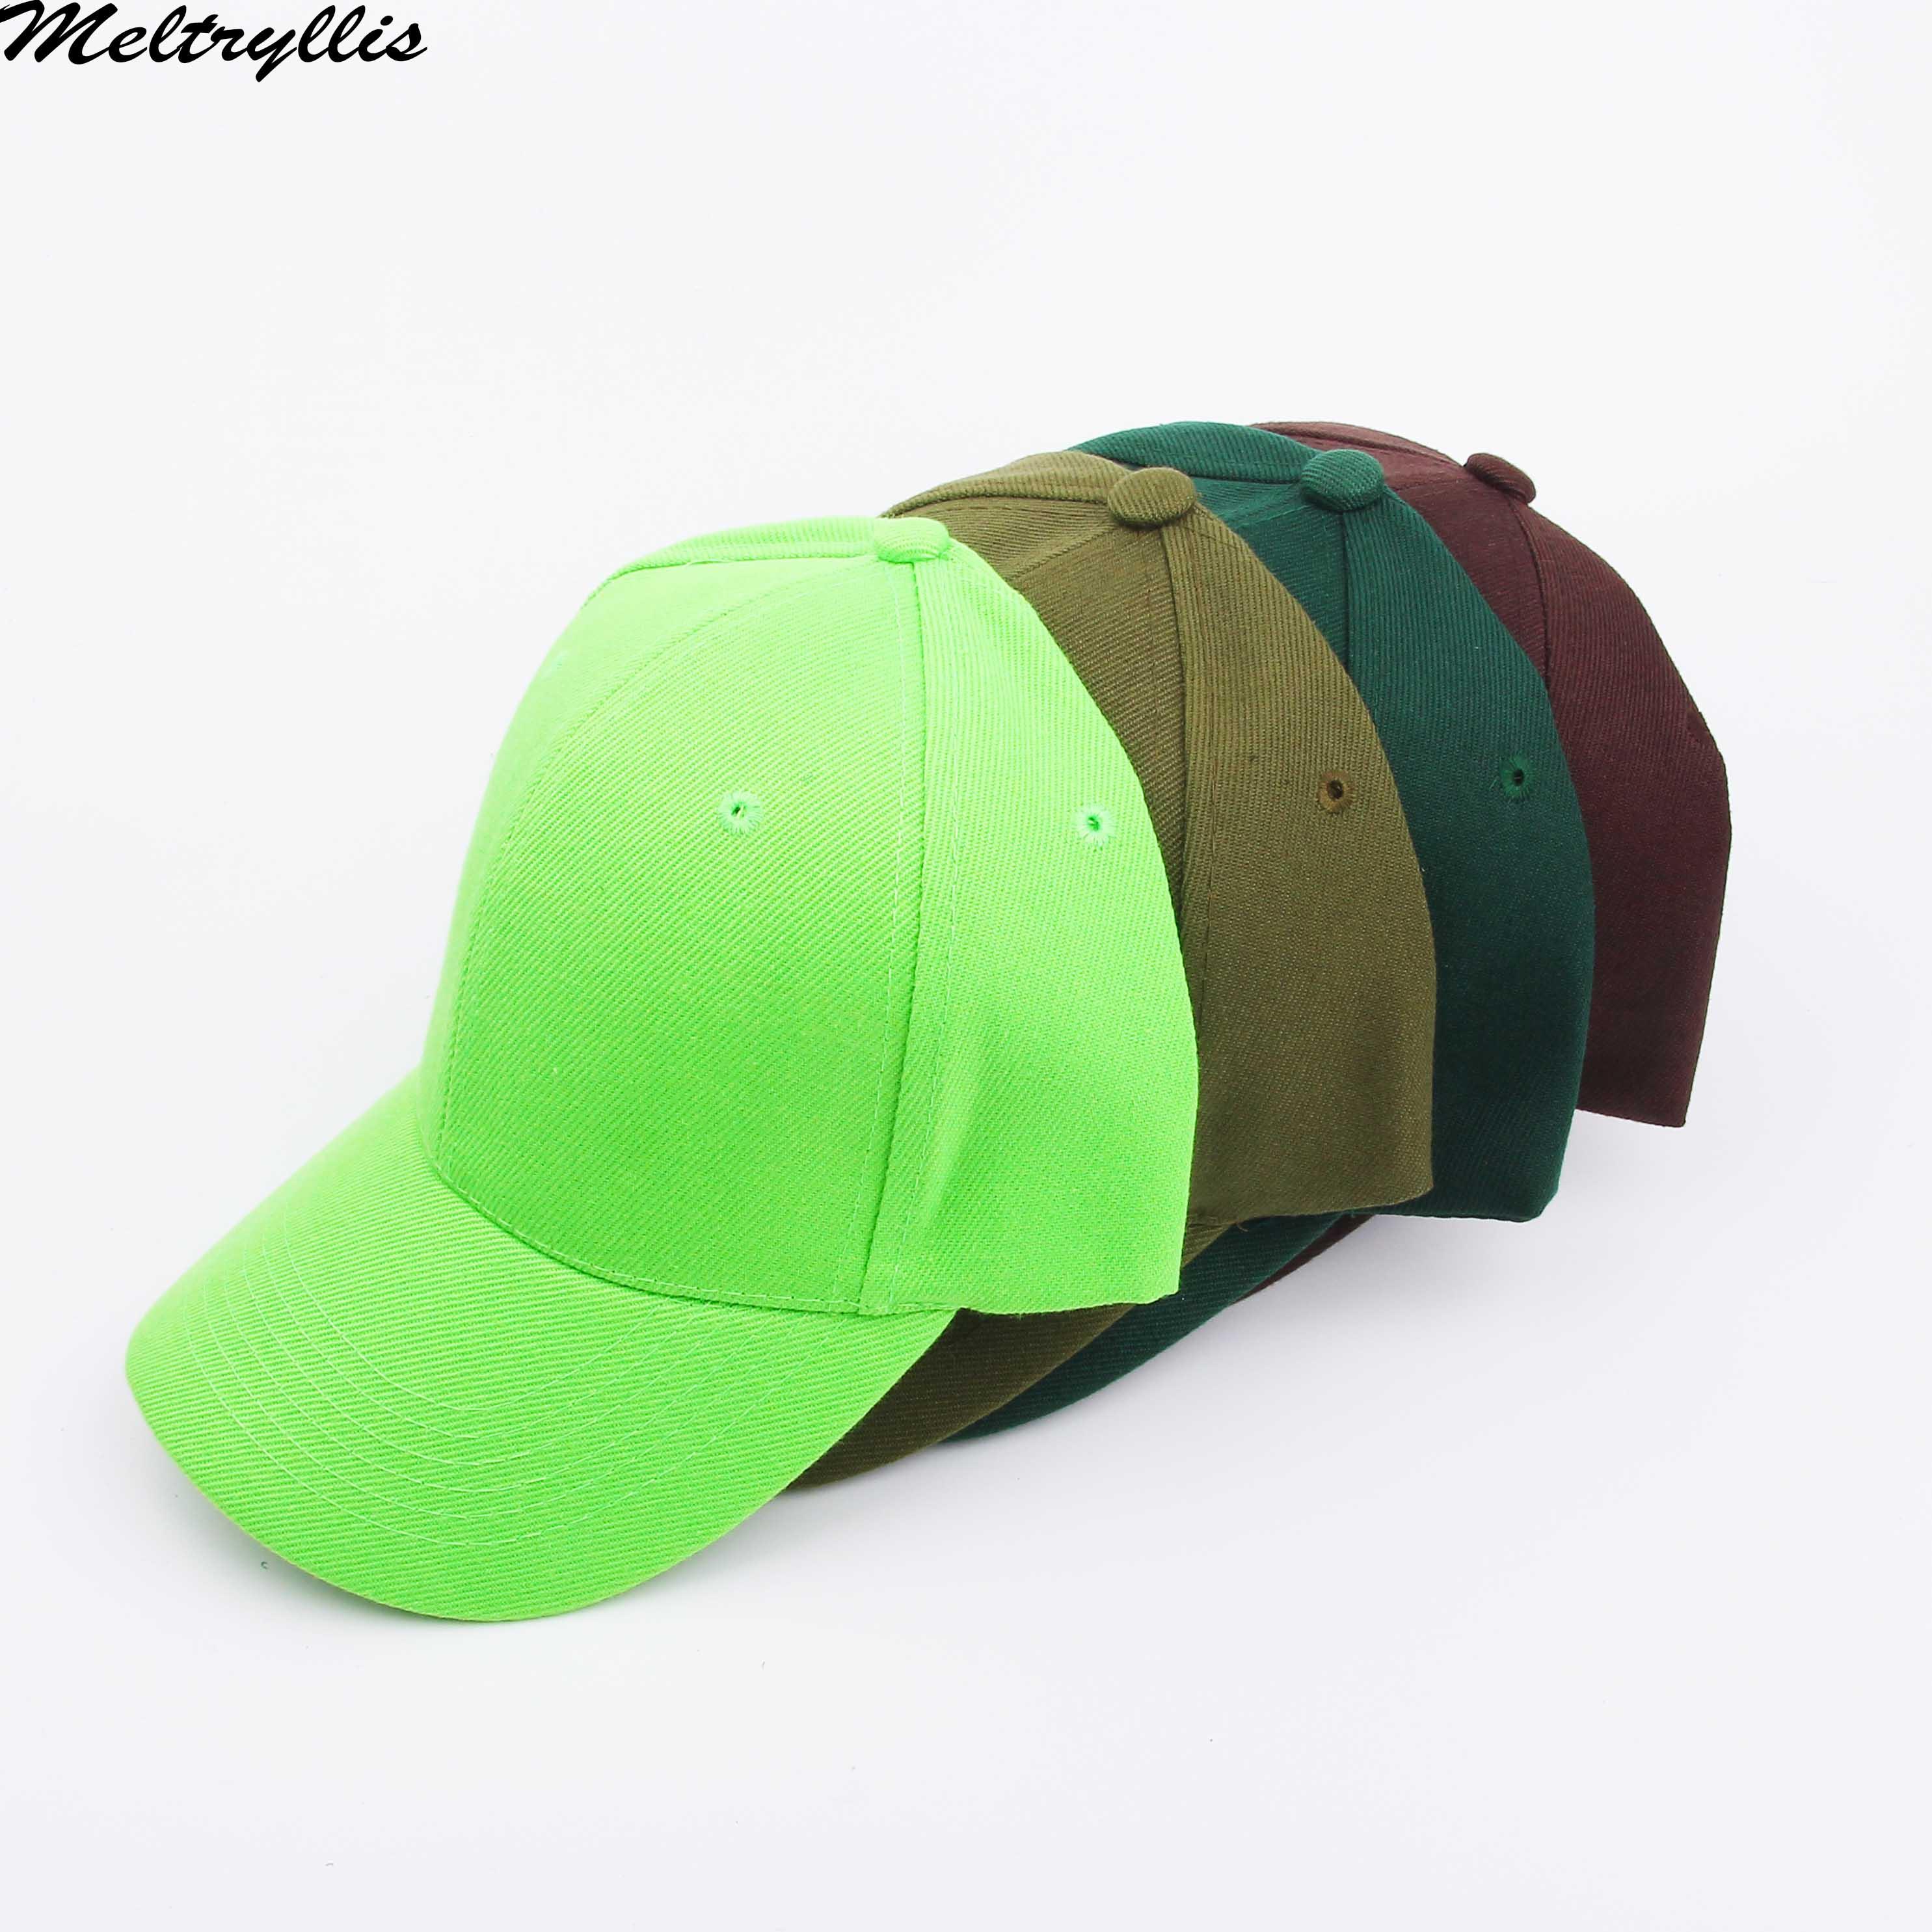 [Meltryllis]4 Colors Unisex Fahsion Baseball Cap Men Women Snapback Hat Hip-Hop Adjustable Army Hats Outdoor Climbing Caps